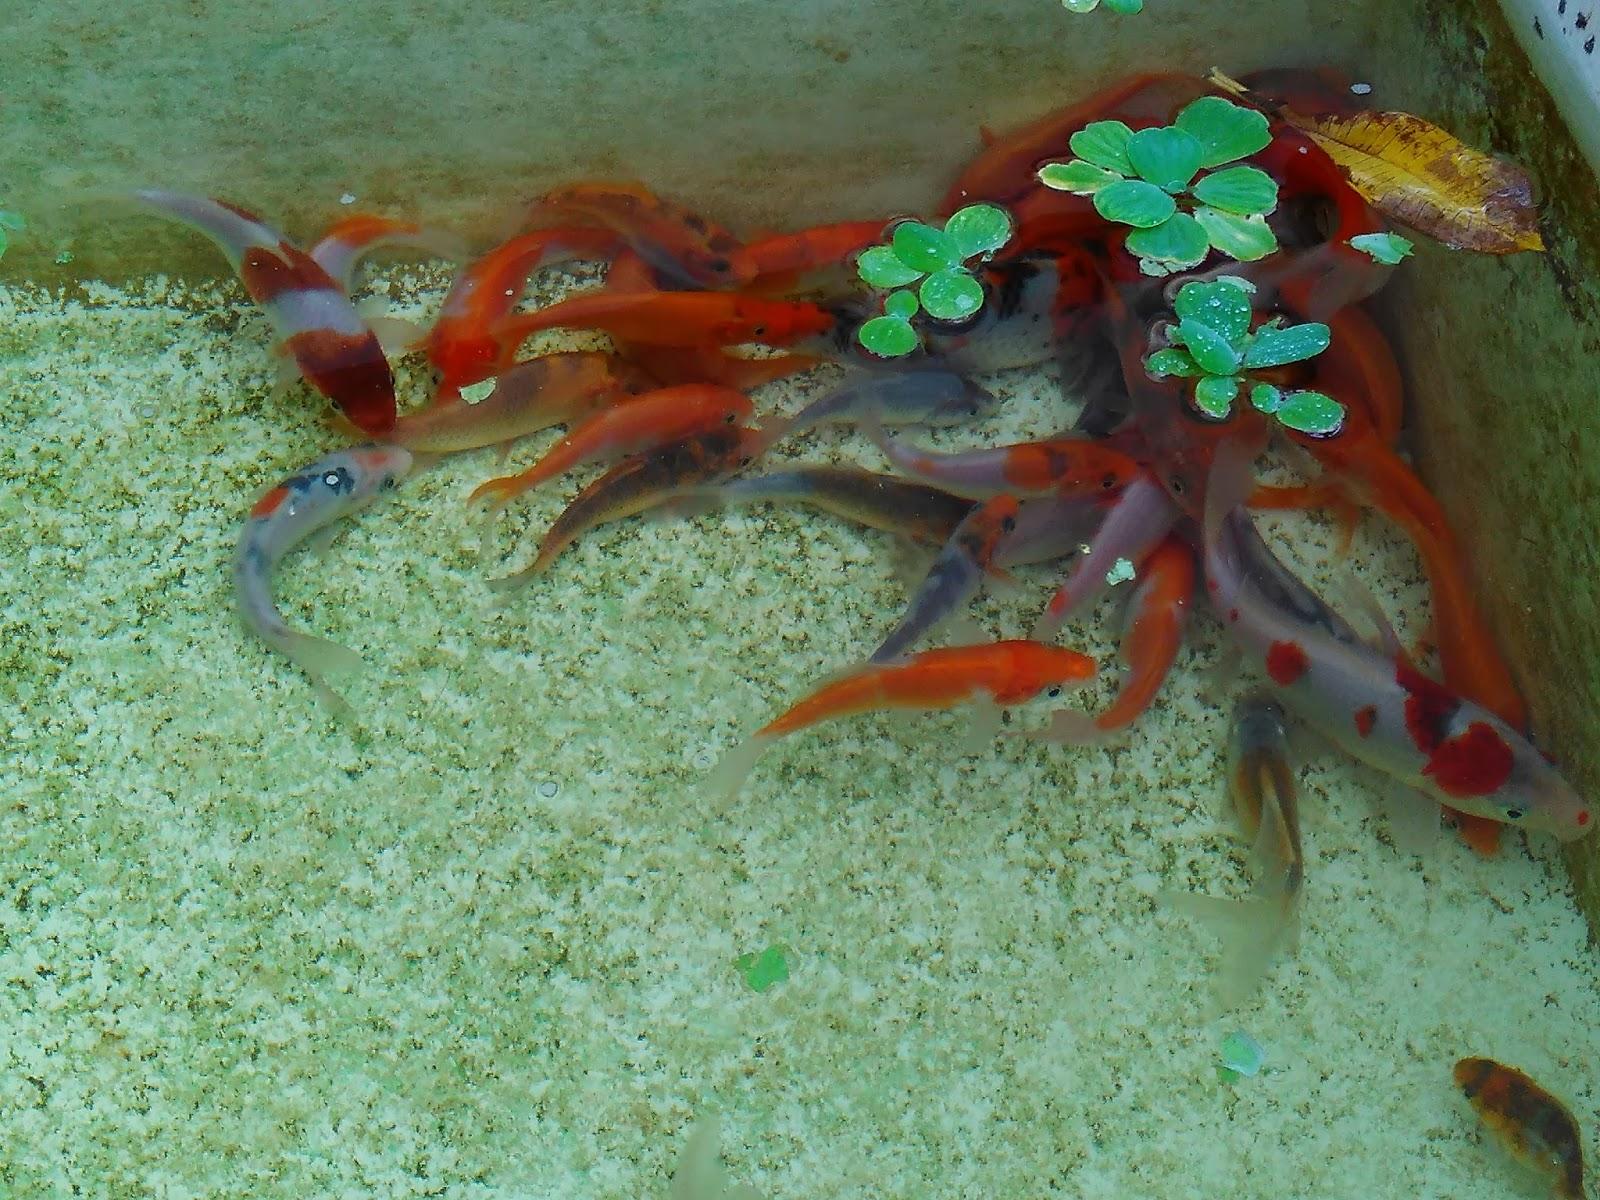 Jem's Aquascape: Fauna Aquascape